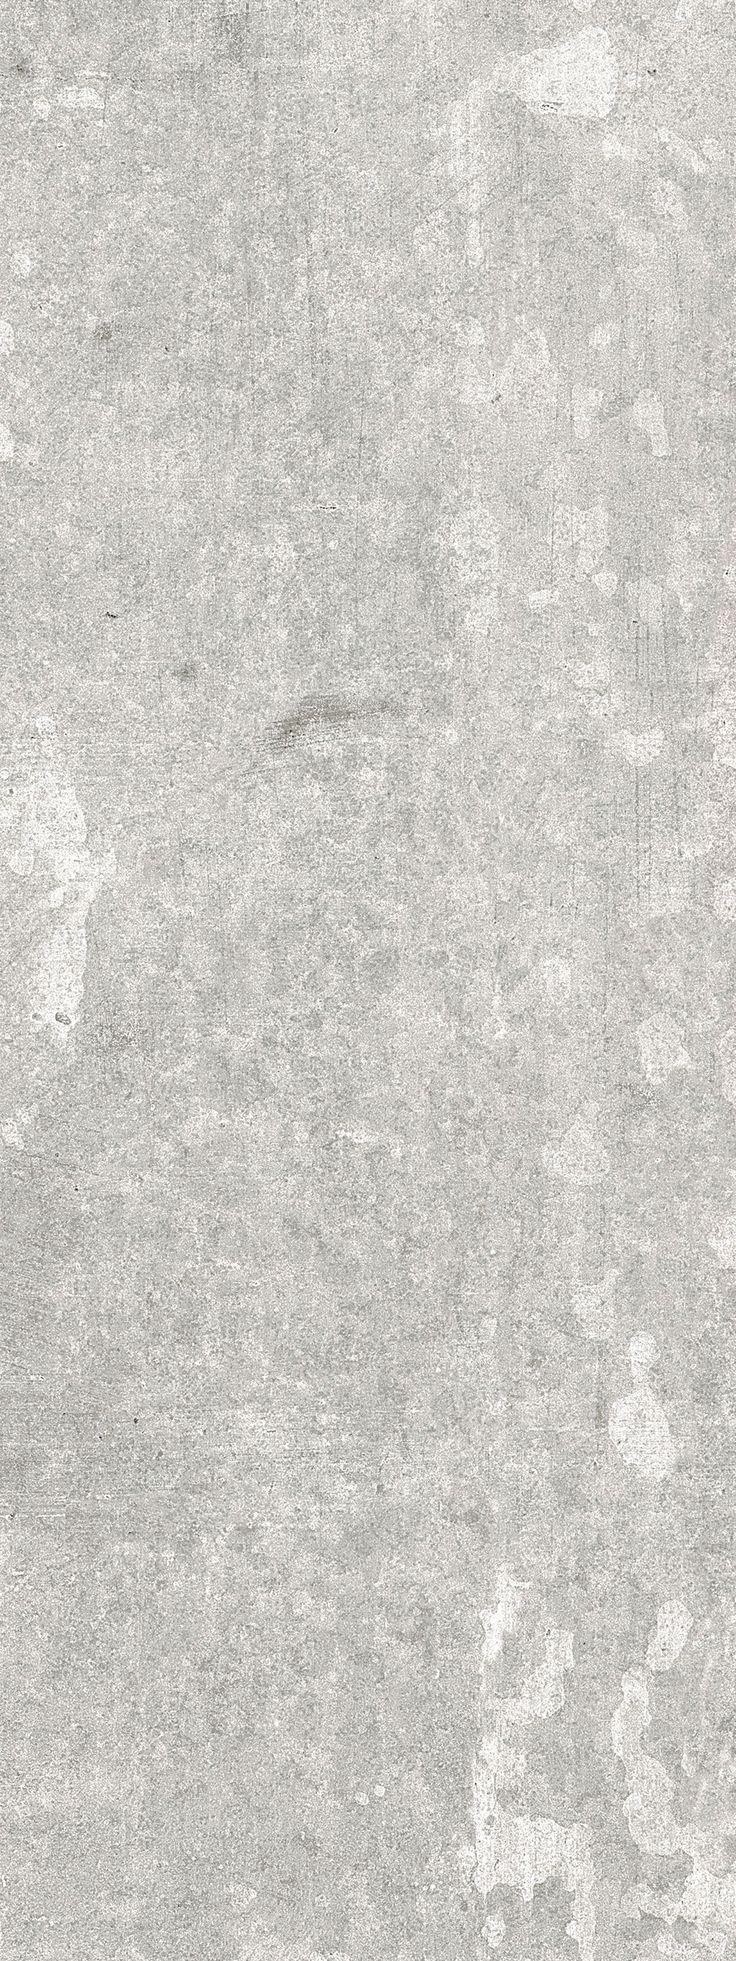 B q bathroom scales - Urban Grey Matt Concrete Effect Ceramic Wall Tile Pack Of 17 L